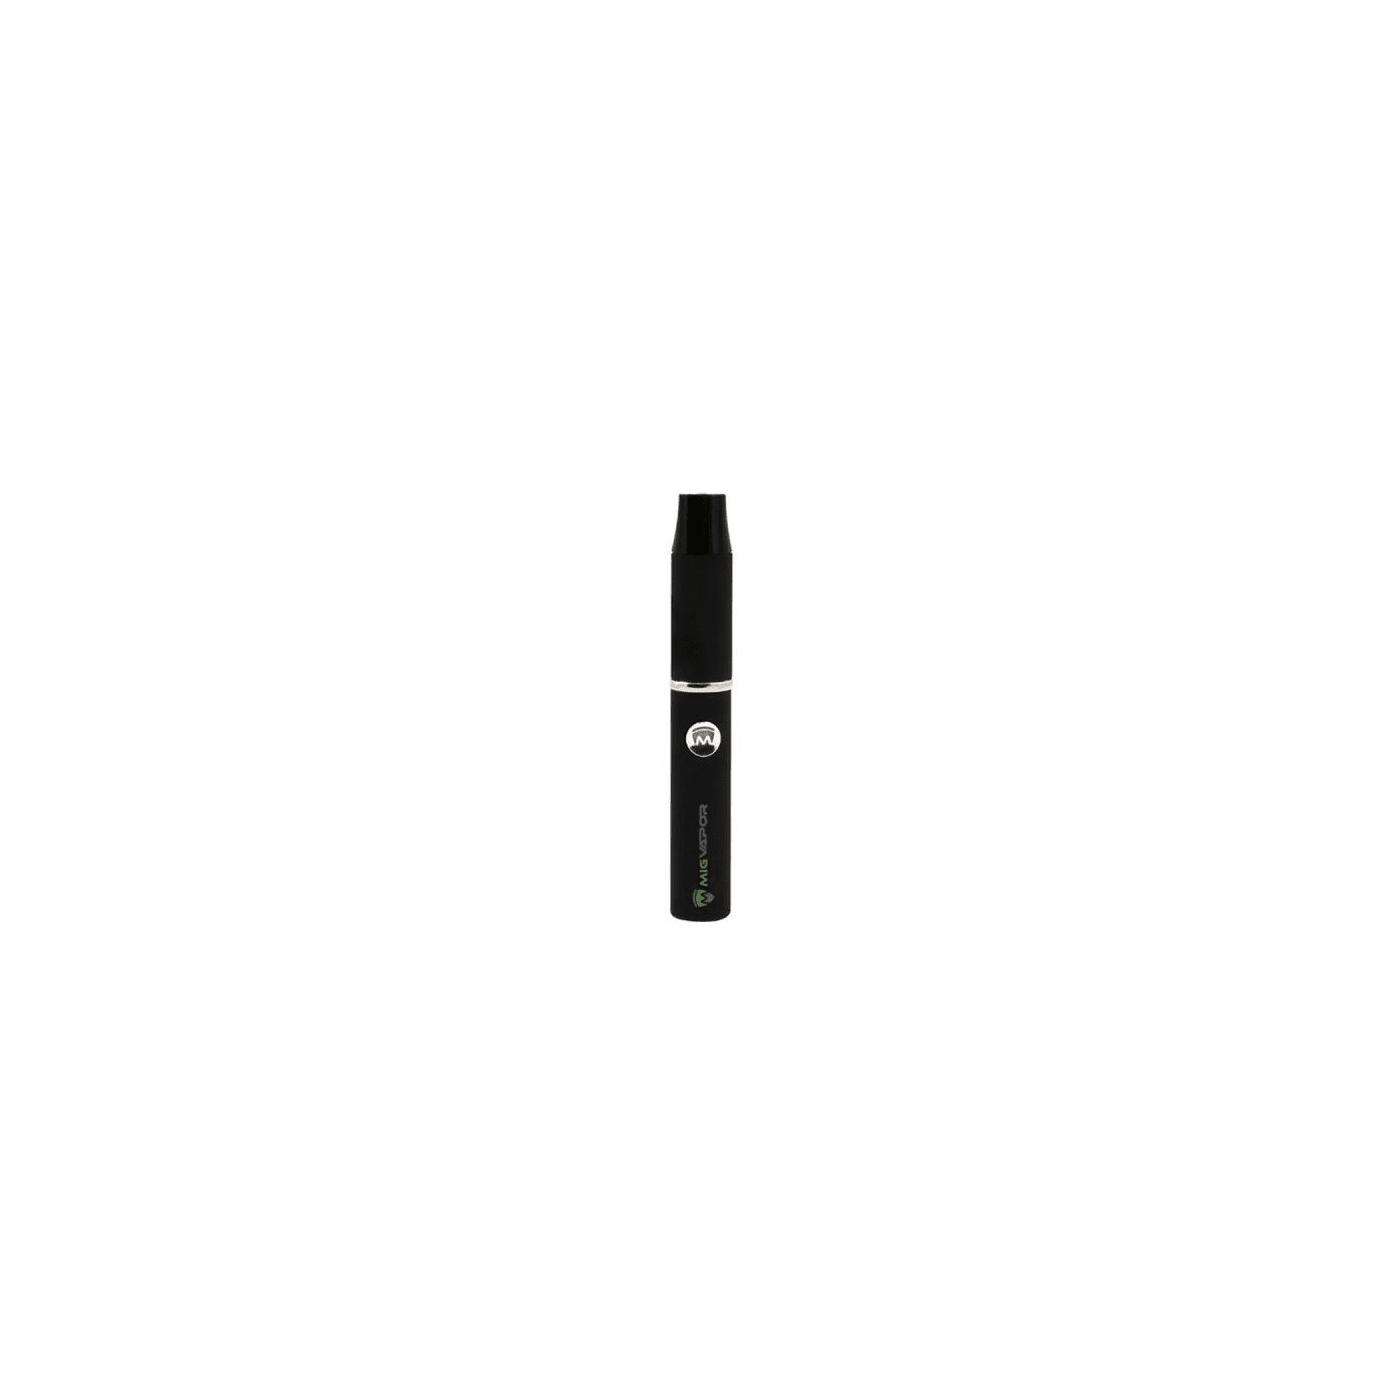 Mig Vapor Keymaker Concentrate Vape Pen